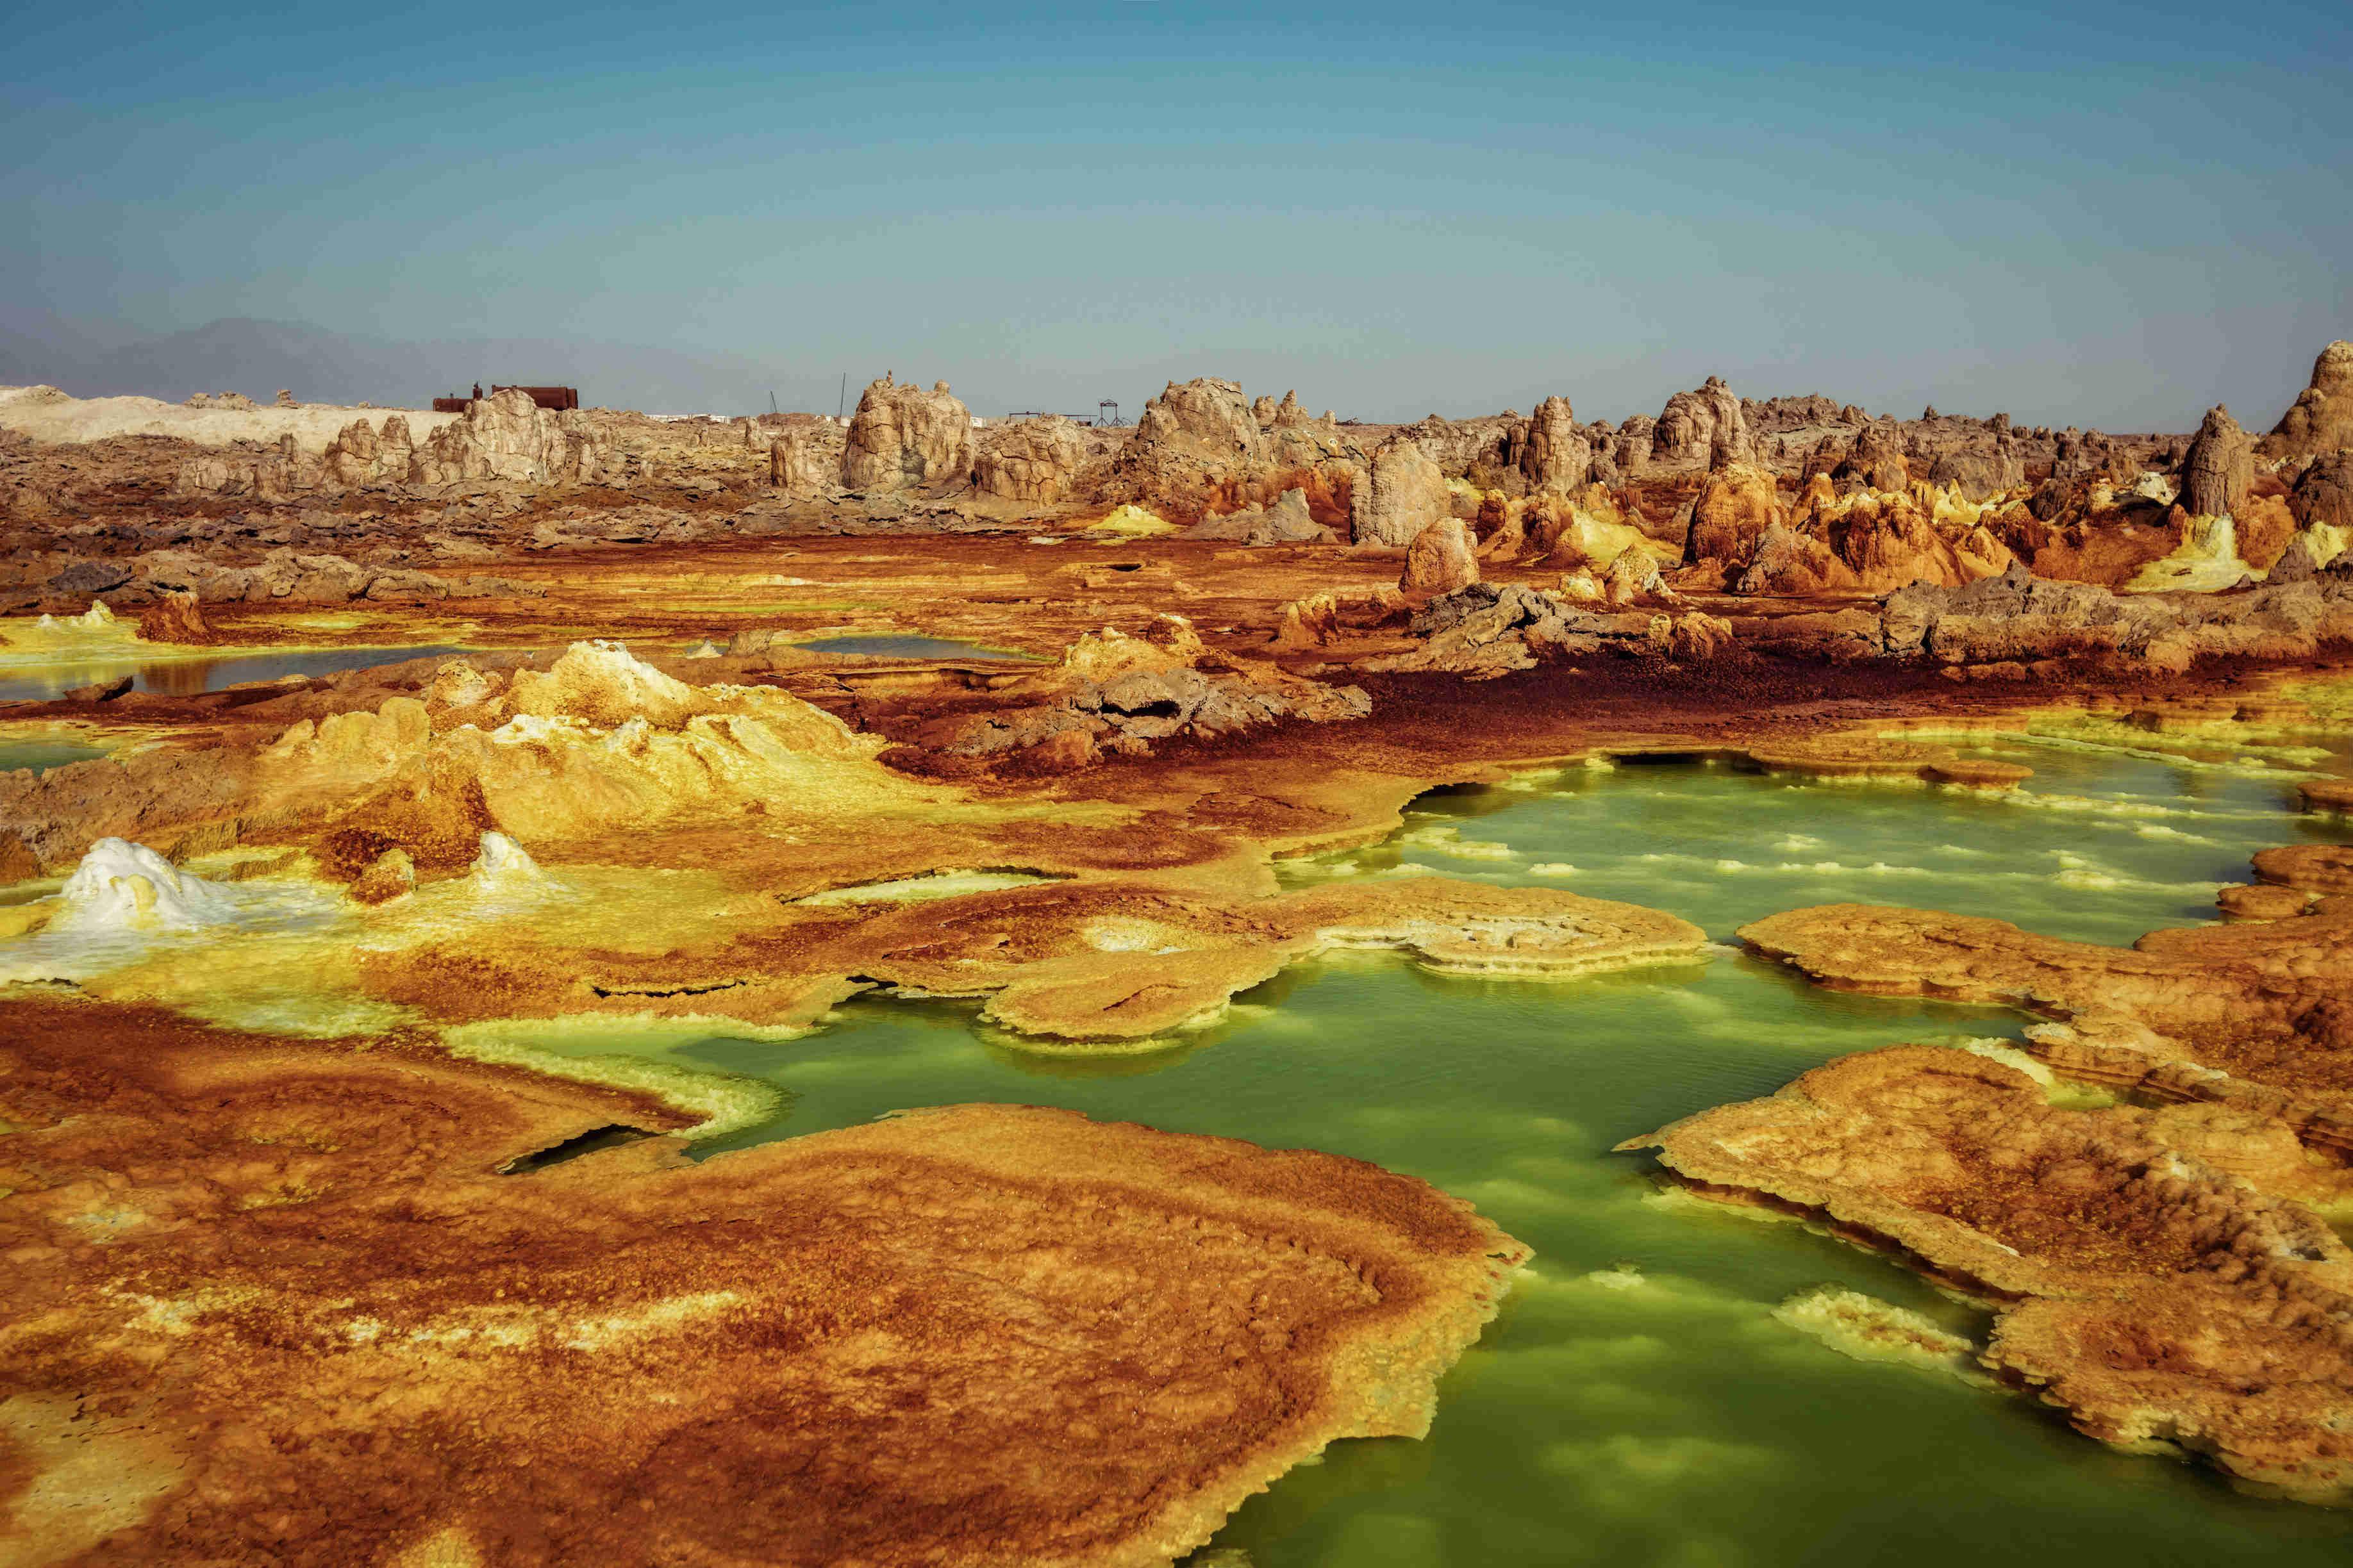 Danakil Depression: Like No Place on Earth